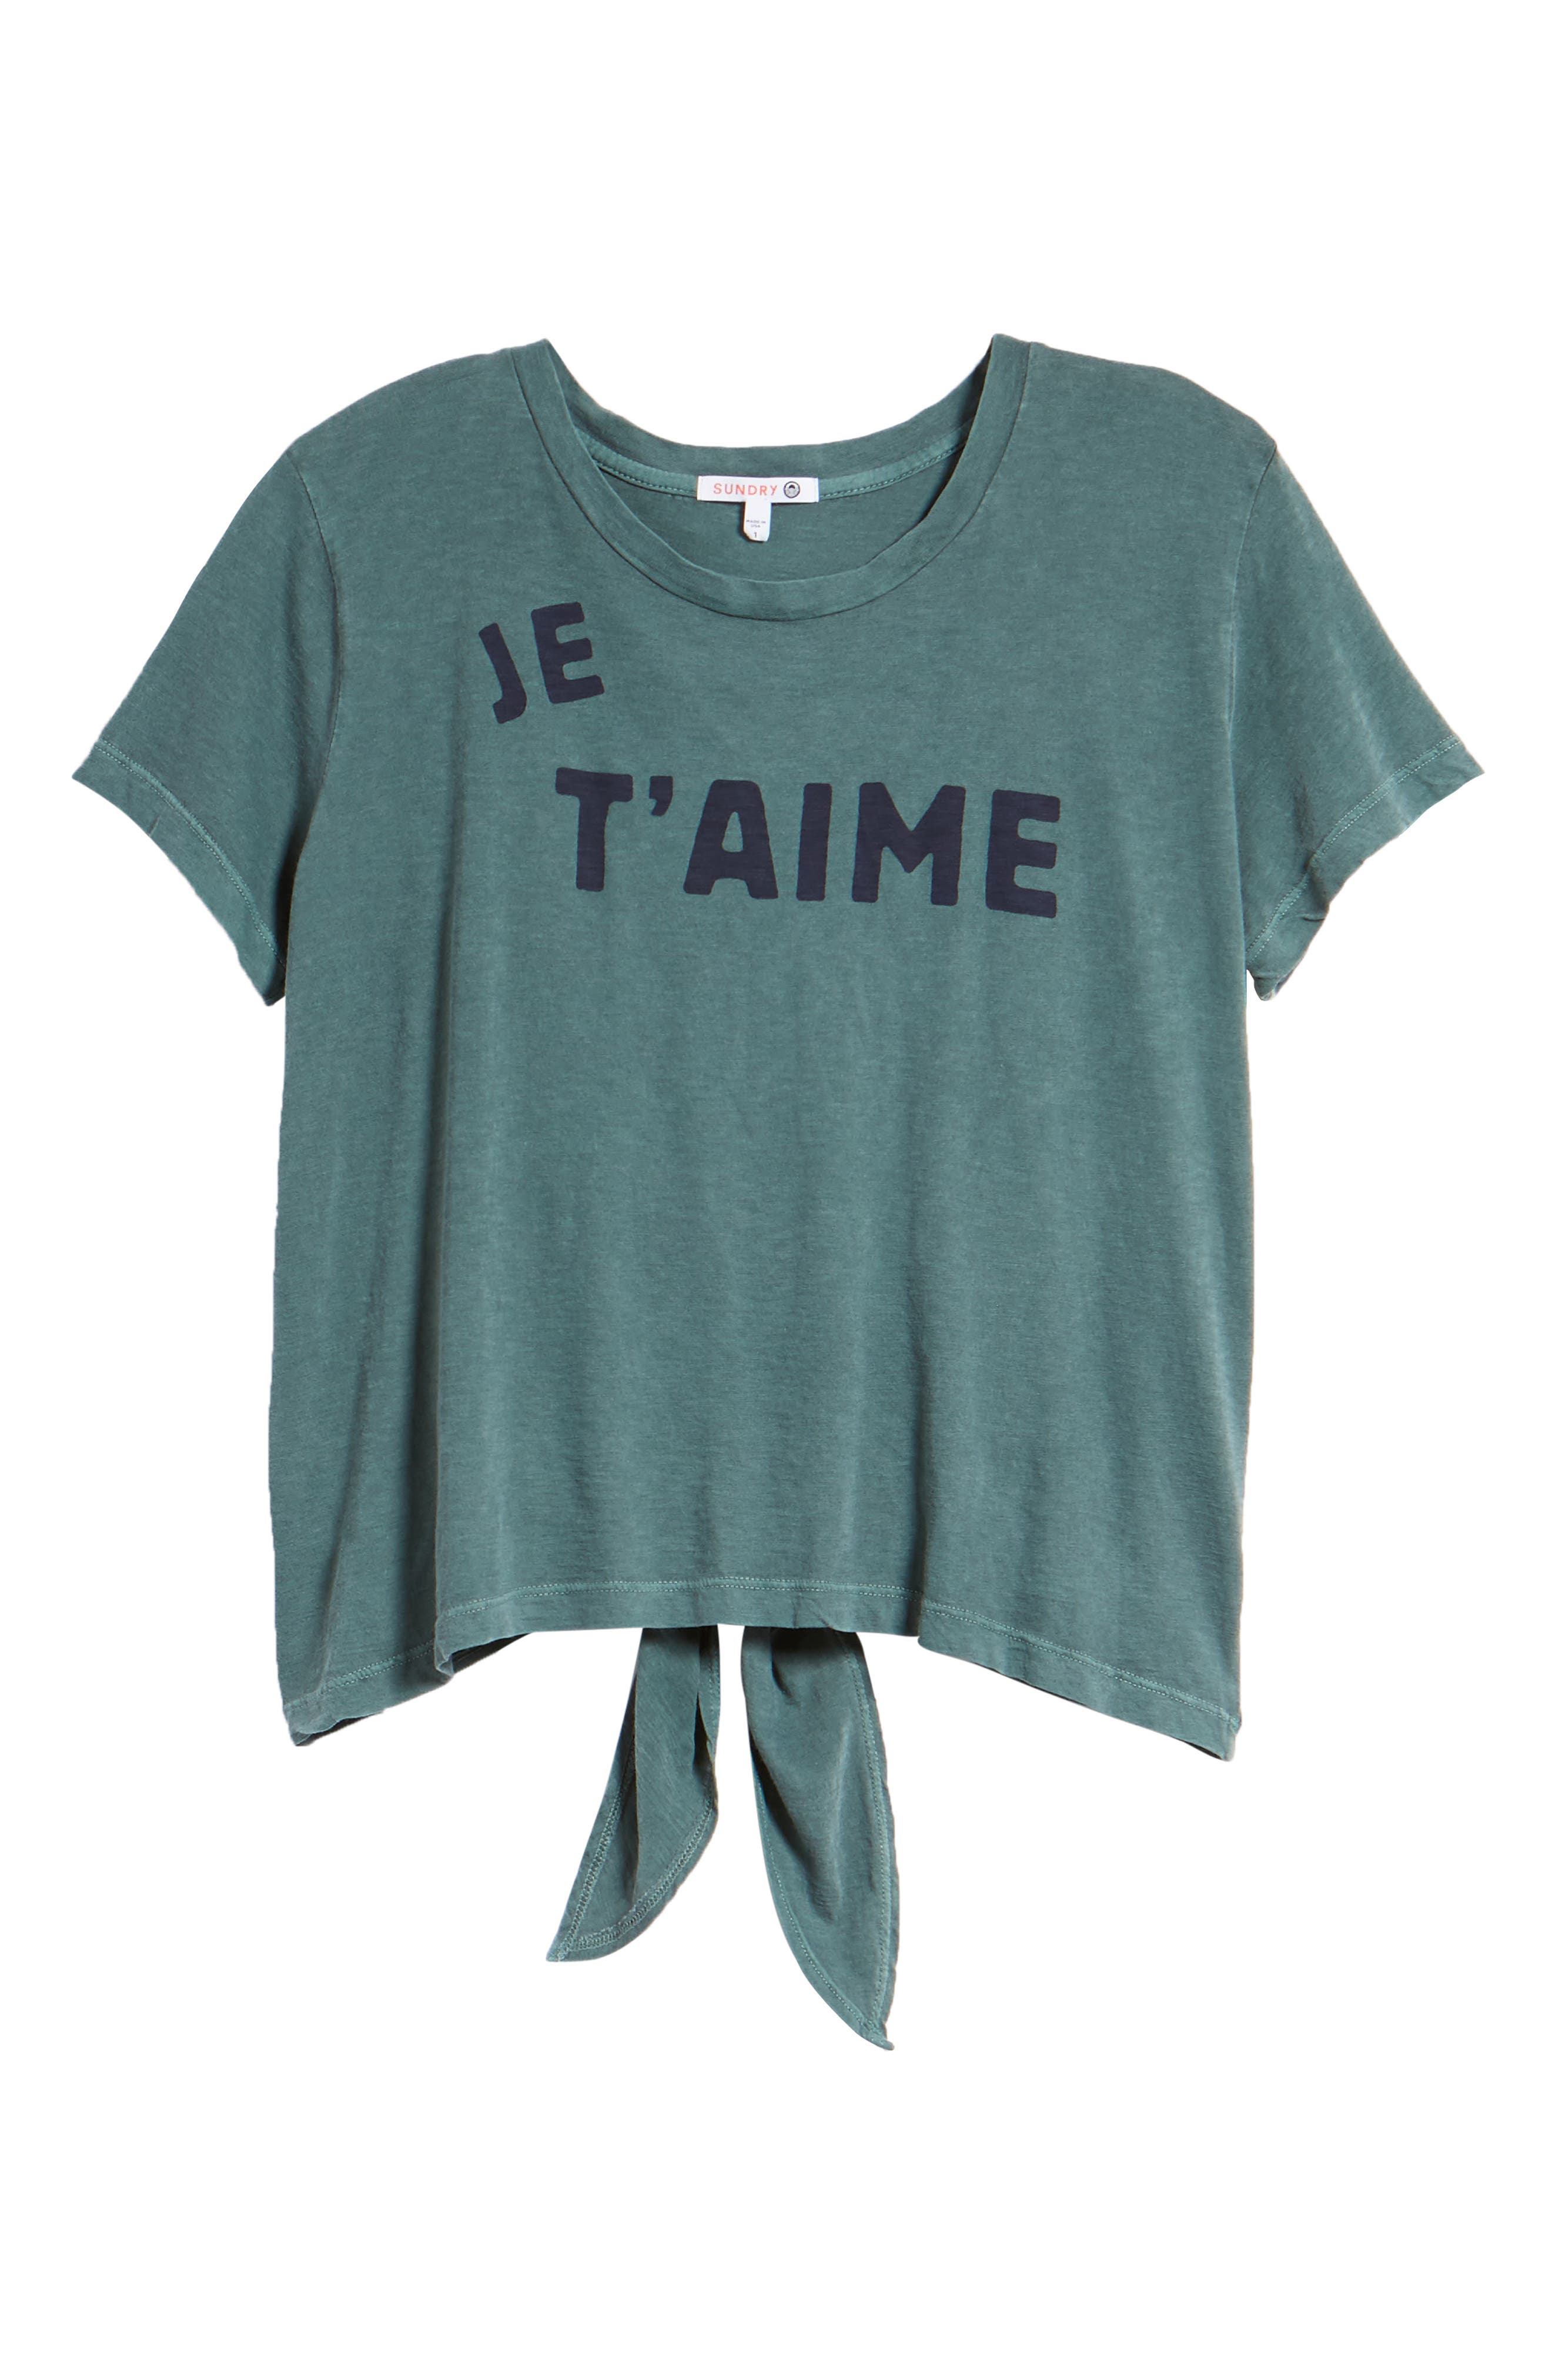 Je T'aime Tie Back Tee,                             Alternate thumbnail 7, color,                             Pigment Forest